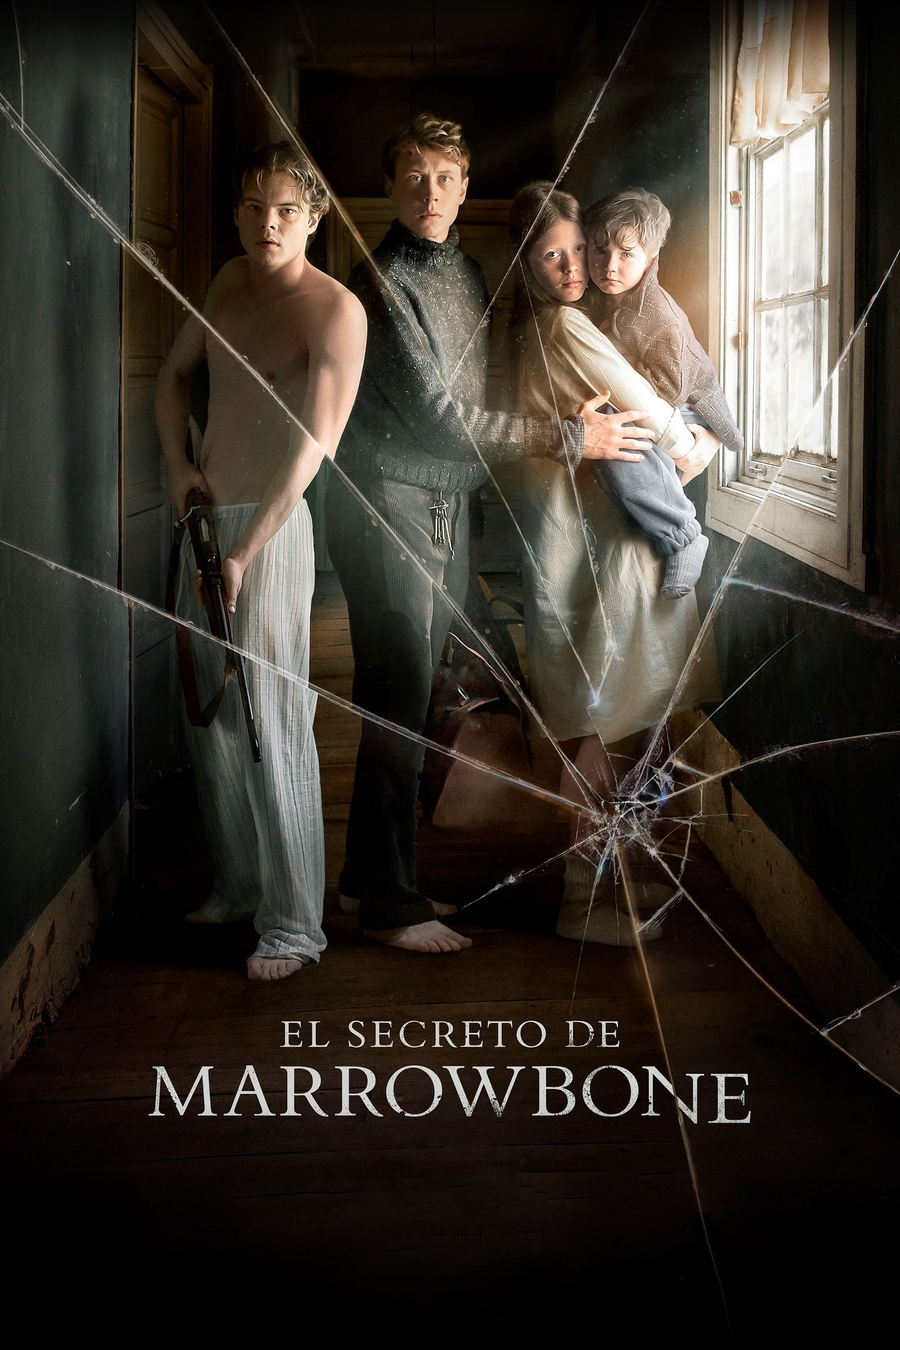 El secret de Marrowbone